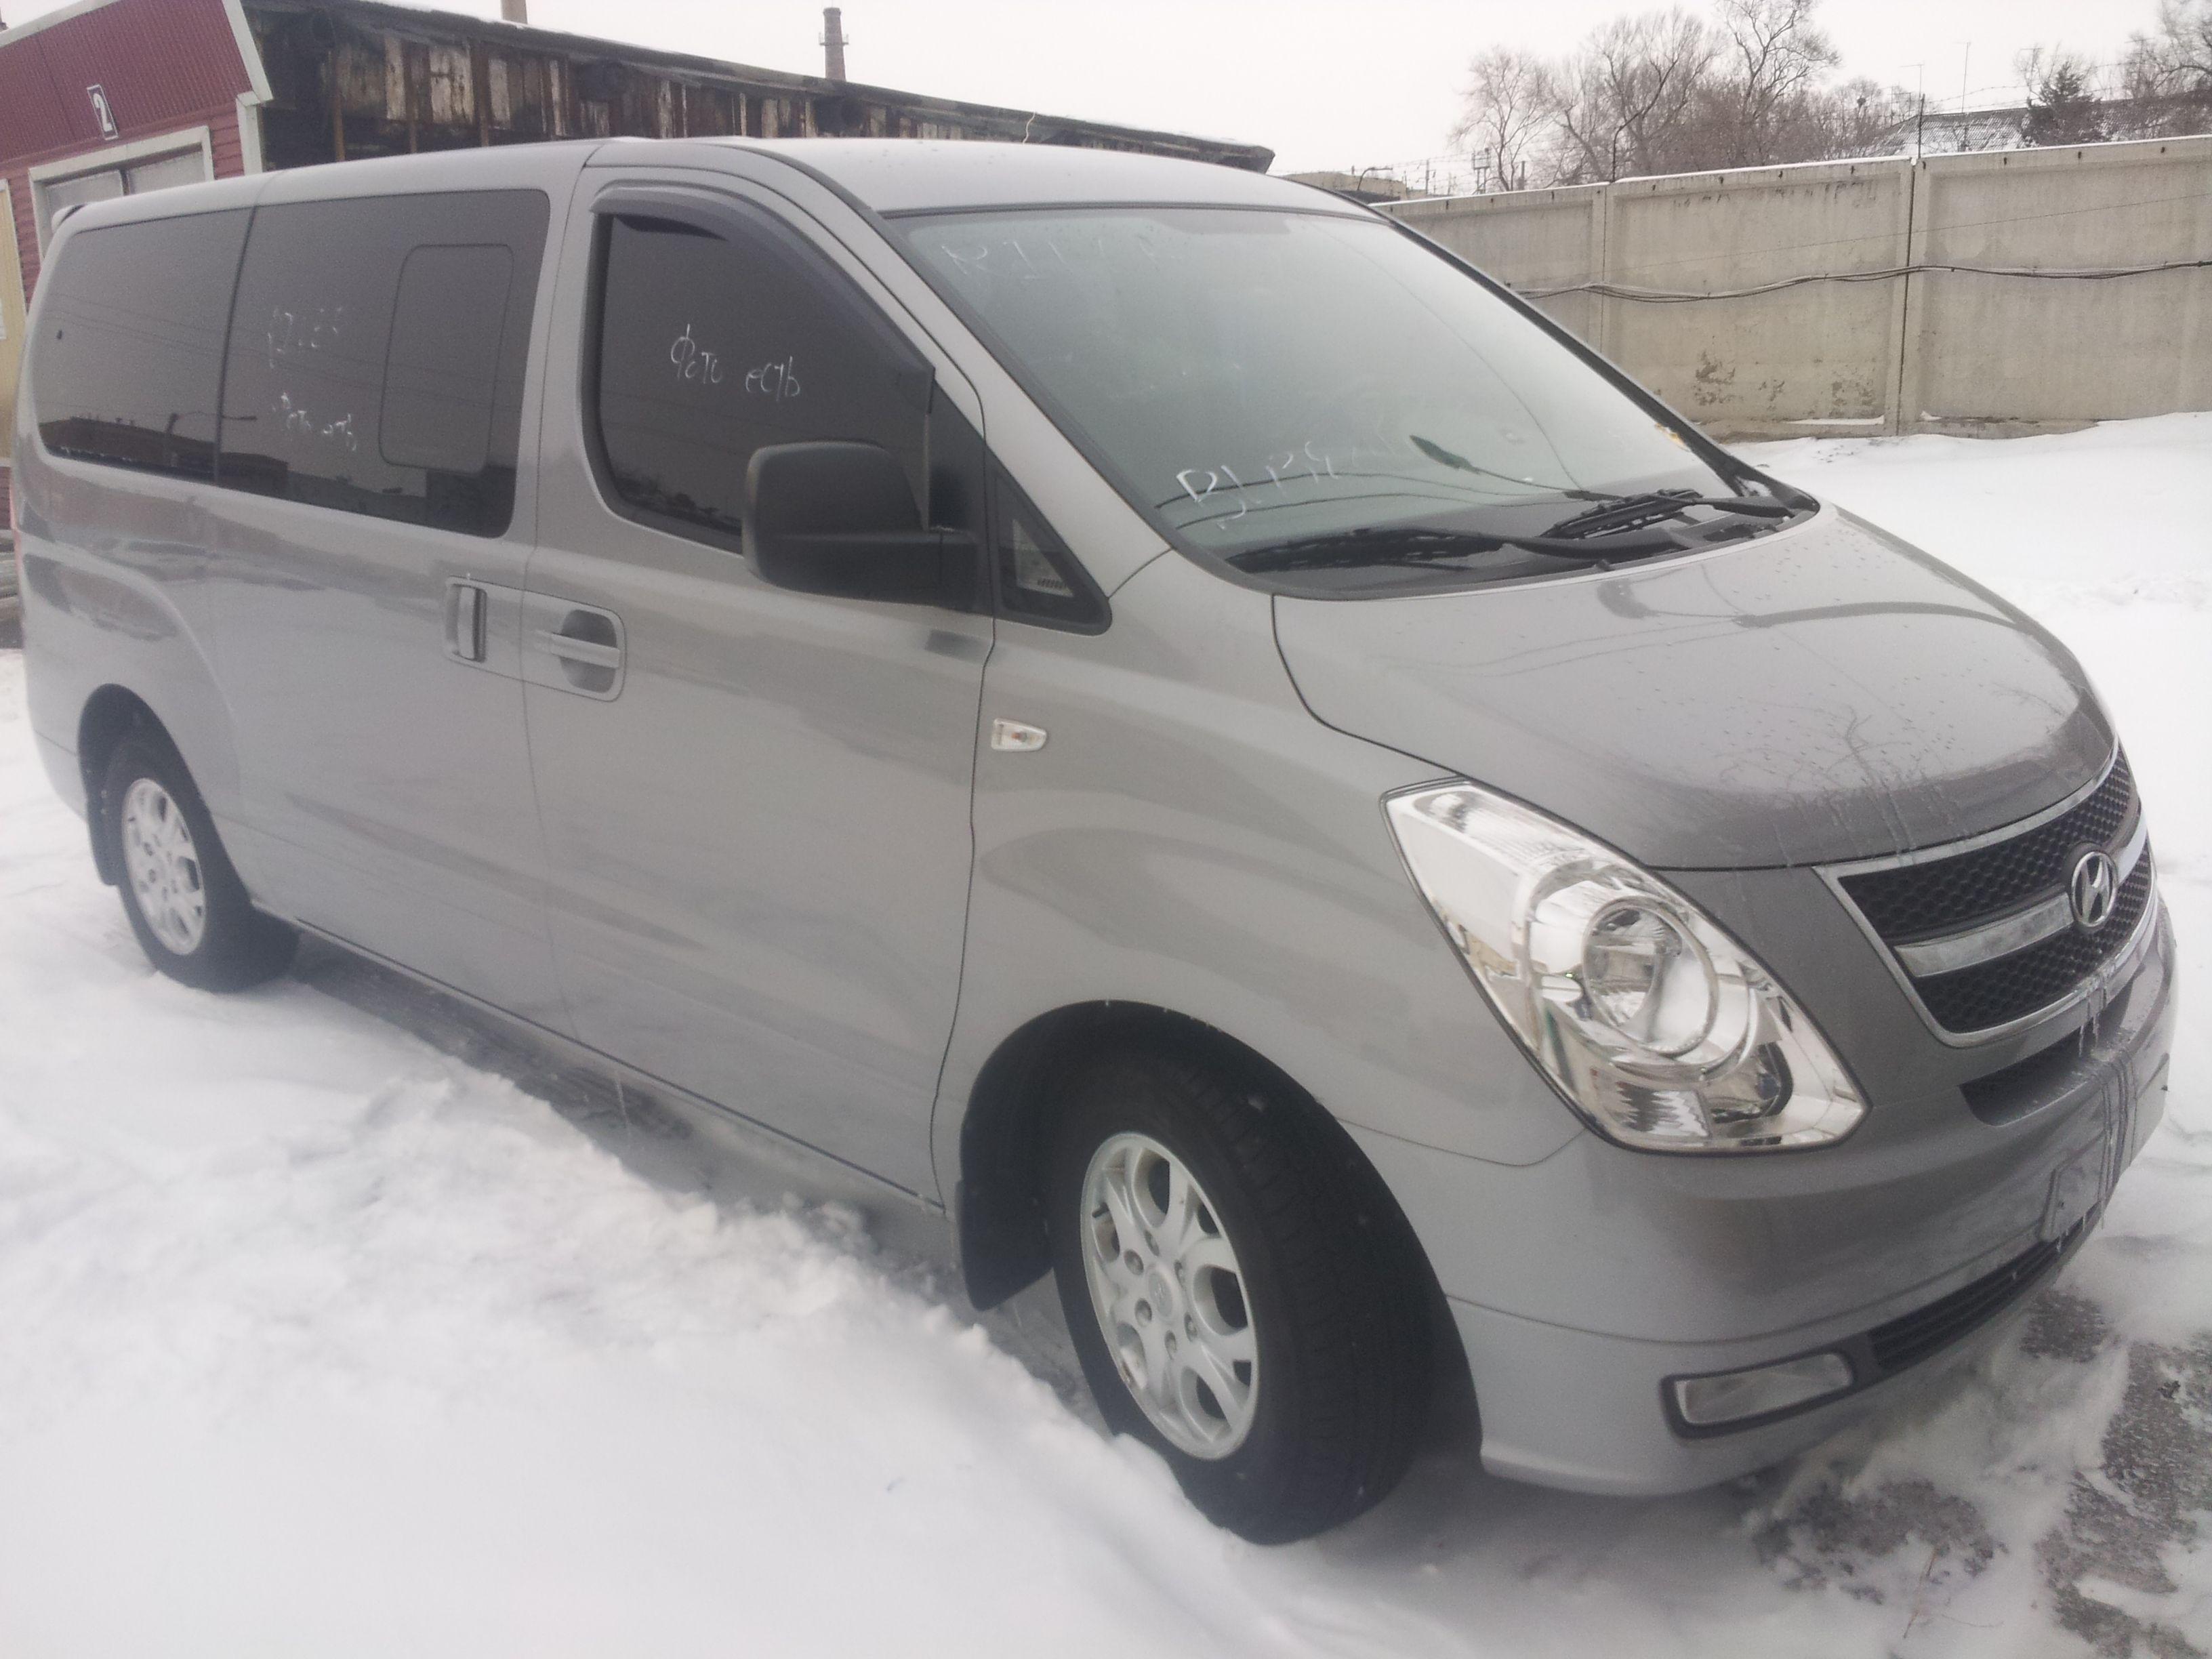 Заказ минивэна микроавтобуса Starex 10 мест Рязань (4912) 24-95-36, 99-67-30